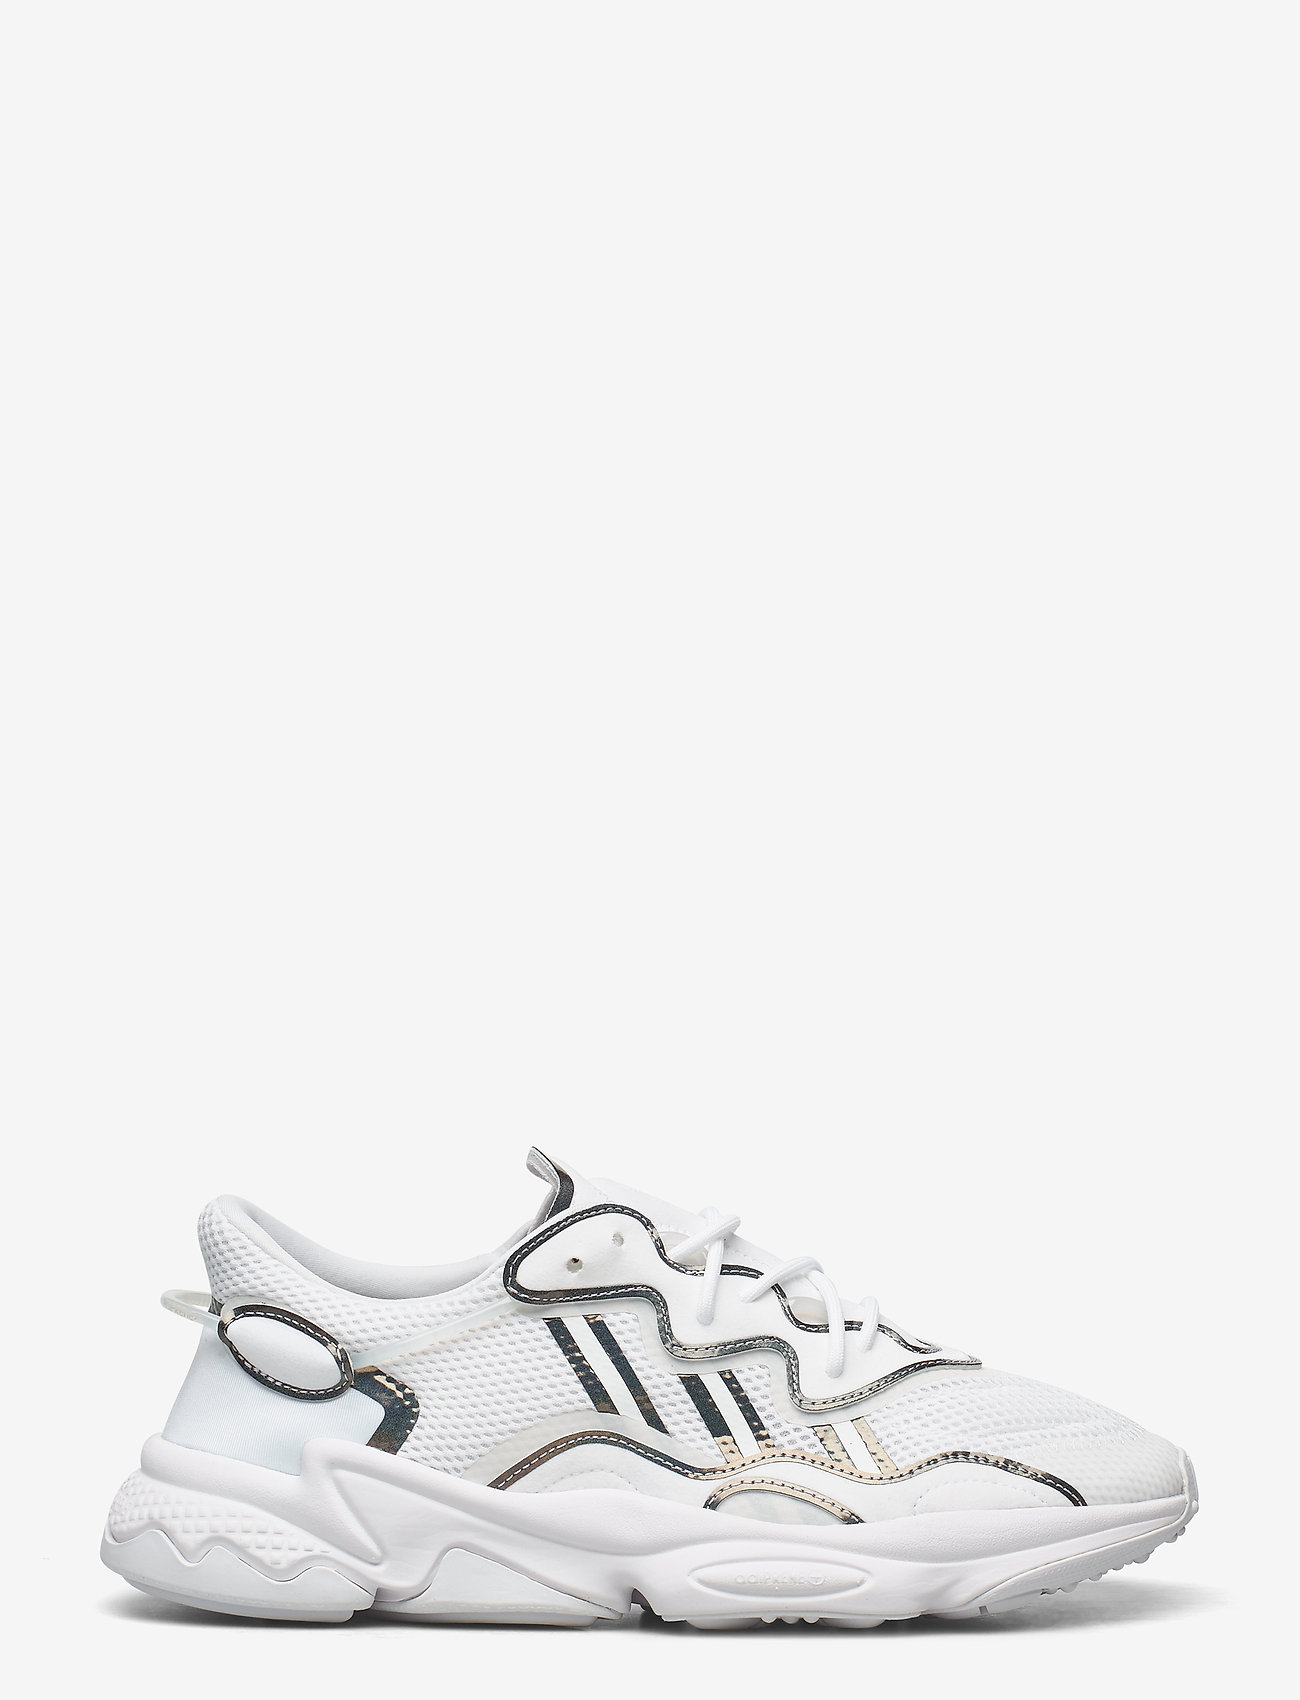 adidas Originals OZWEEGO - Sneakers - ftwwht/ftwwht/cblack